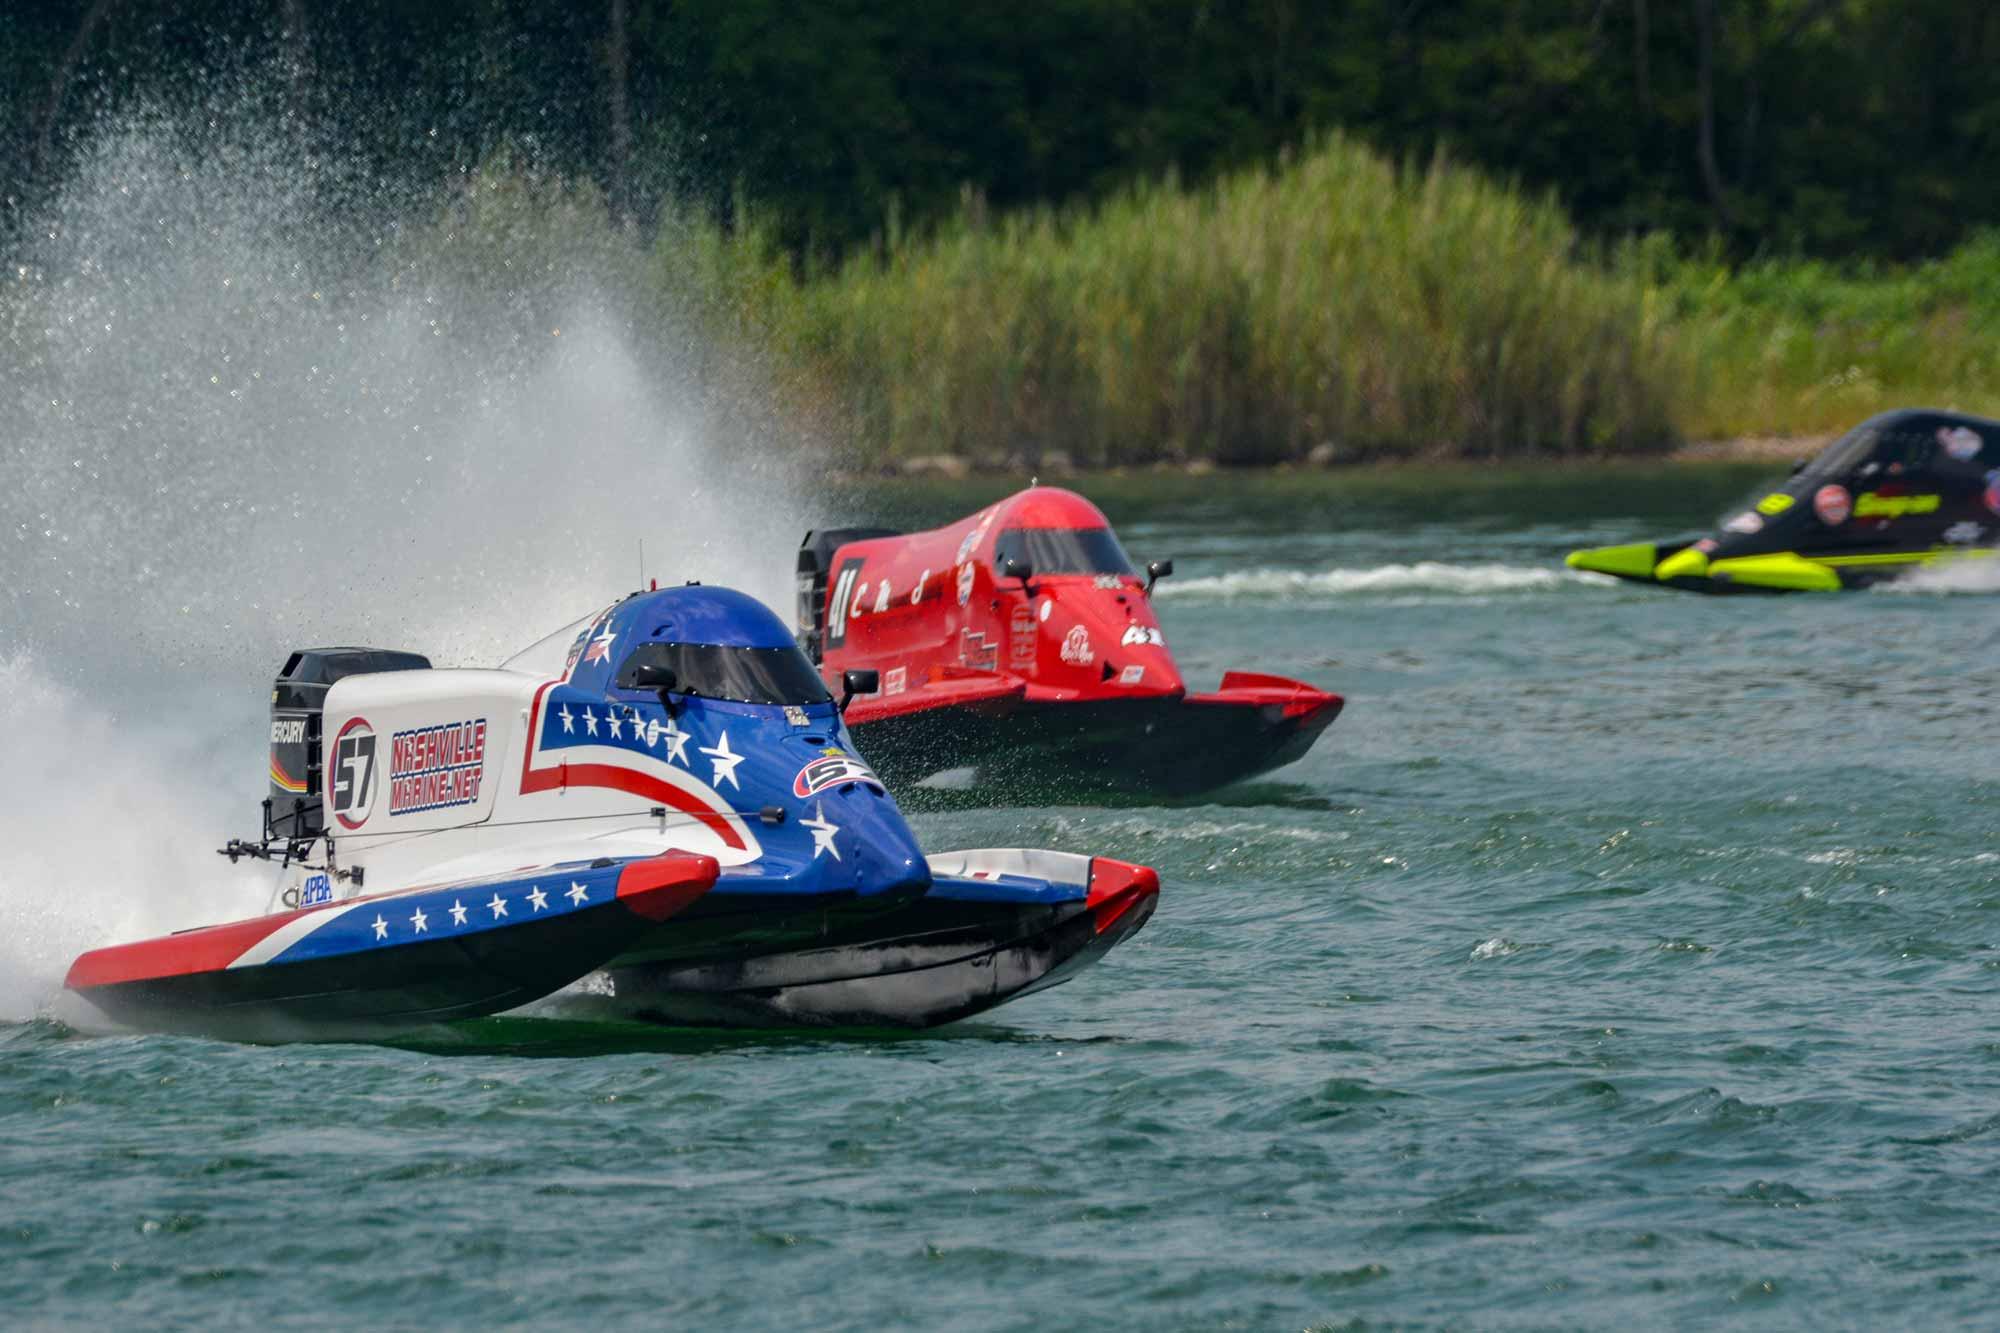 McMurray-Racing-Nashvill-Marine-2021-Springfield-F1-Race-50